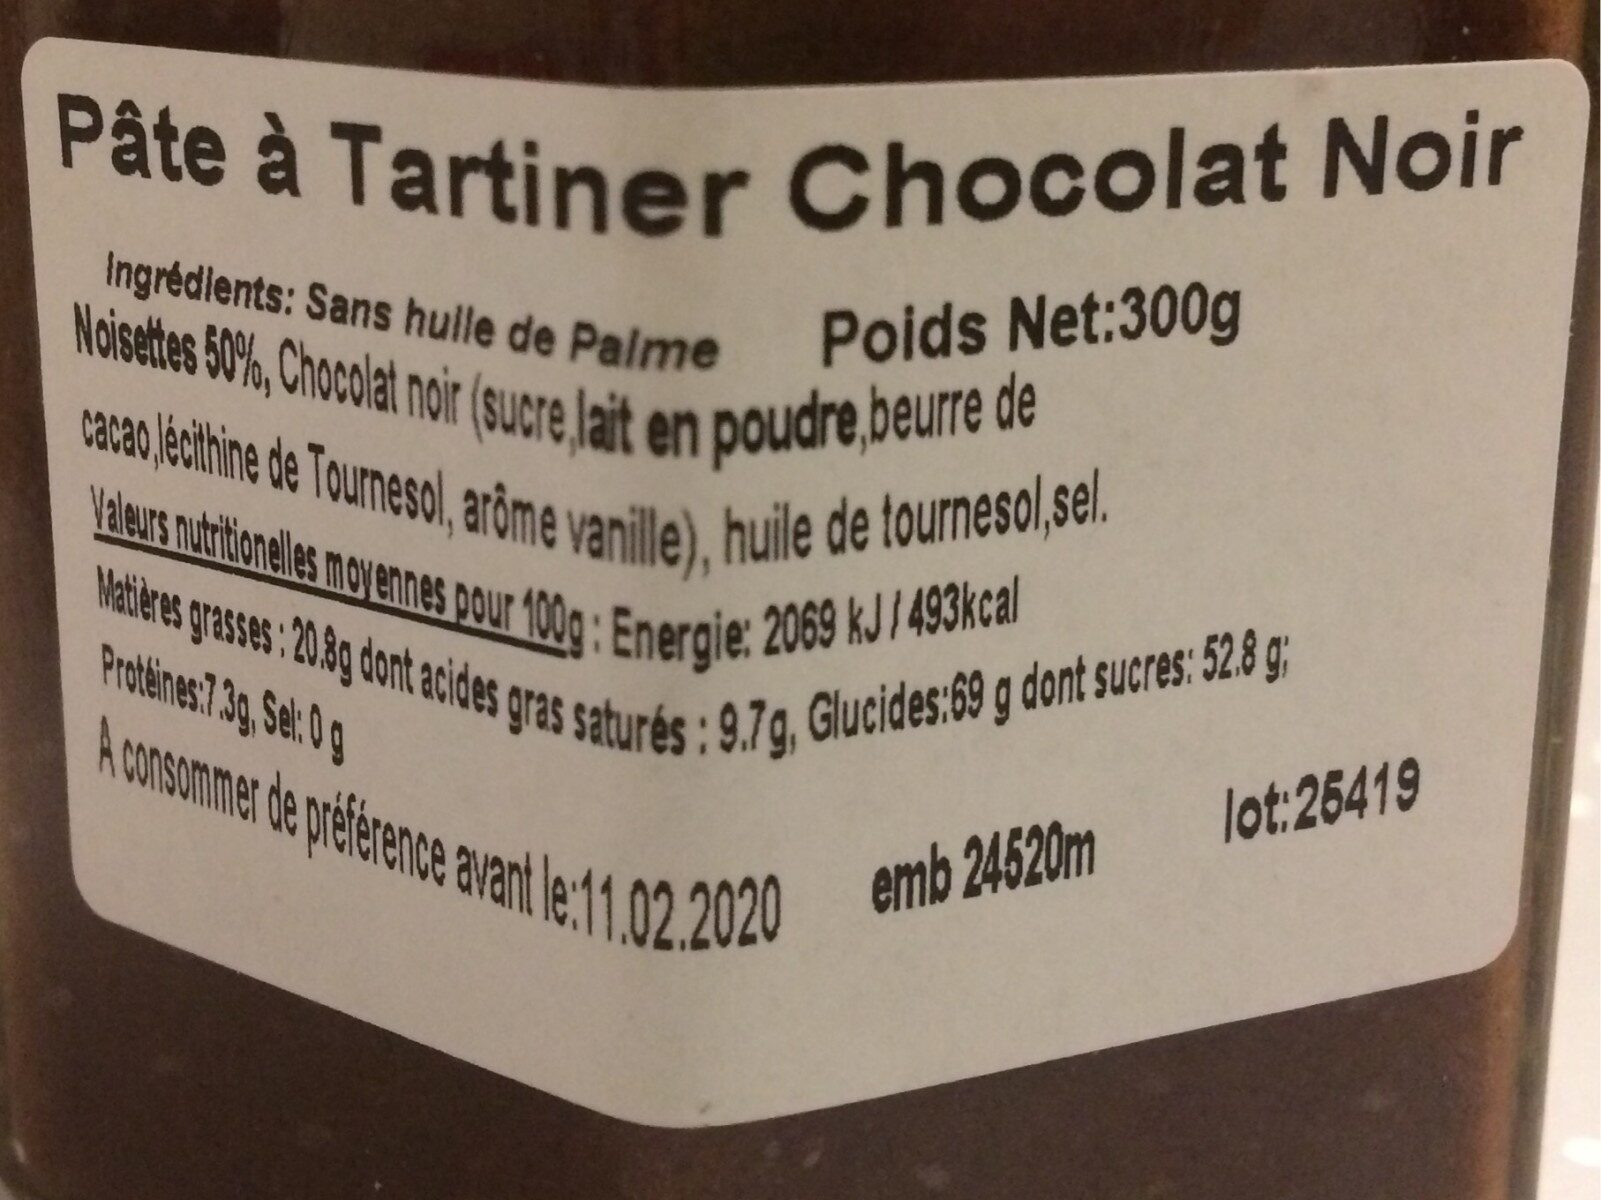 Pate à tartiner chocolat noir - Nutrition facts - fr